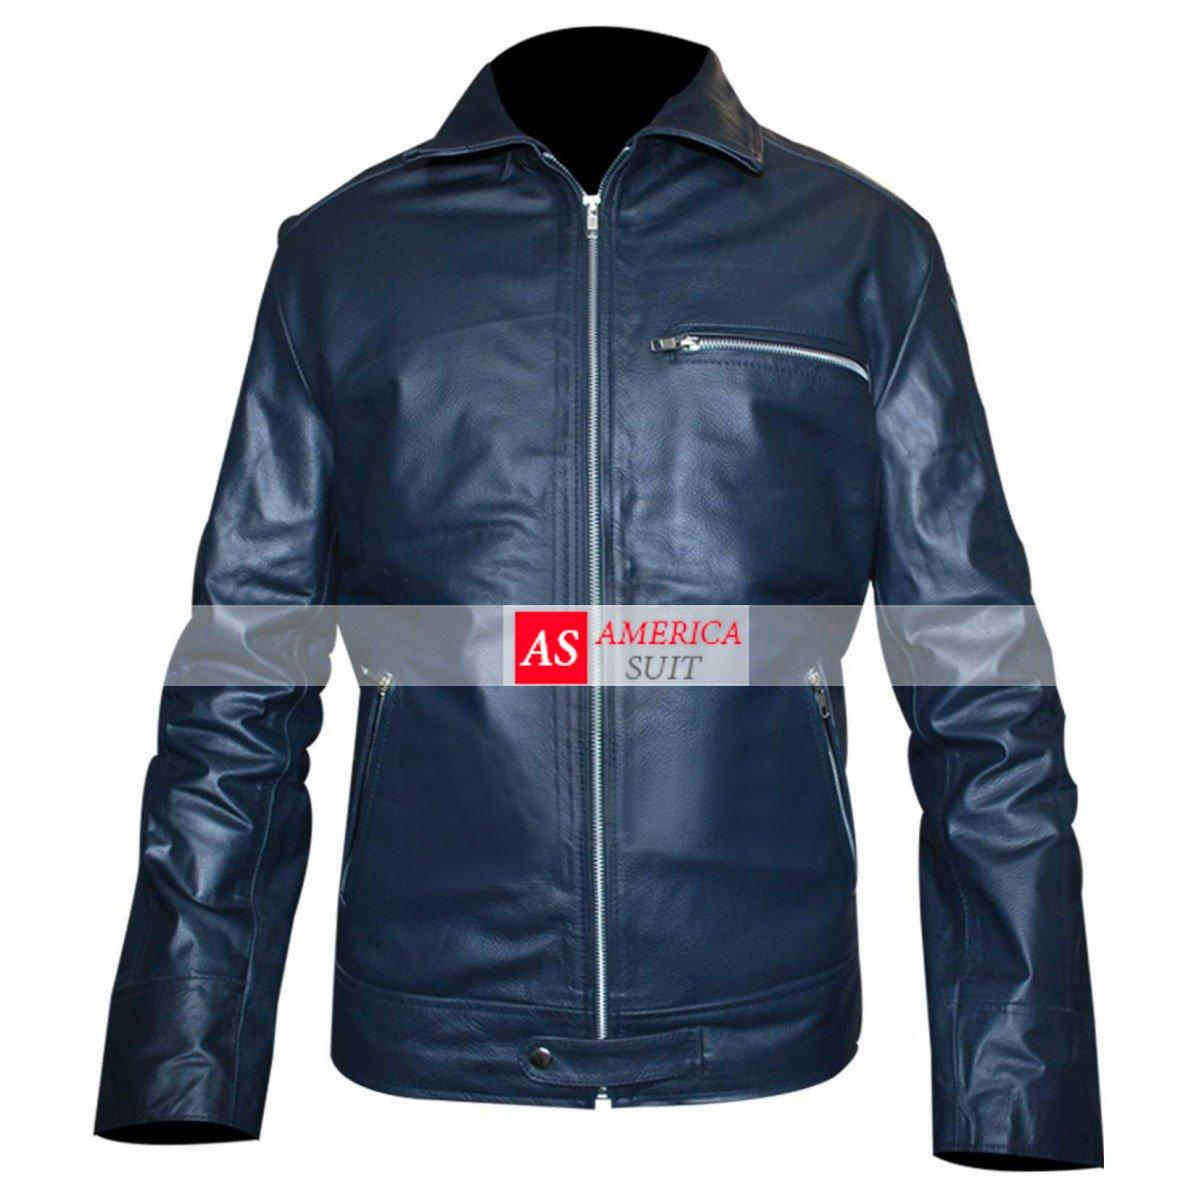 aaron_paul_need_for_speed_jacket